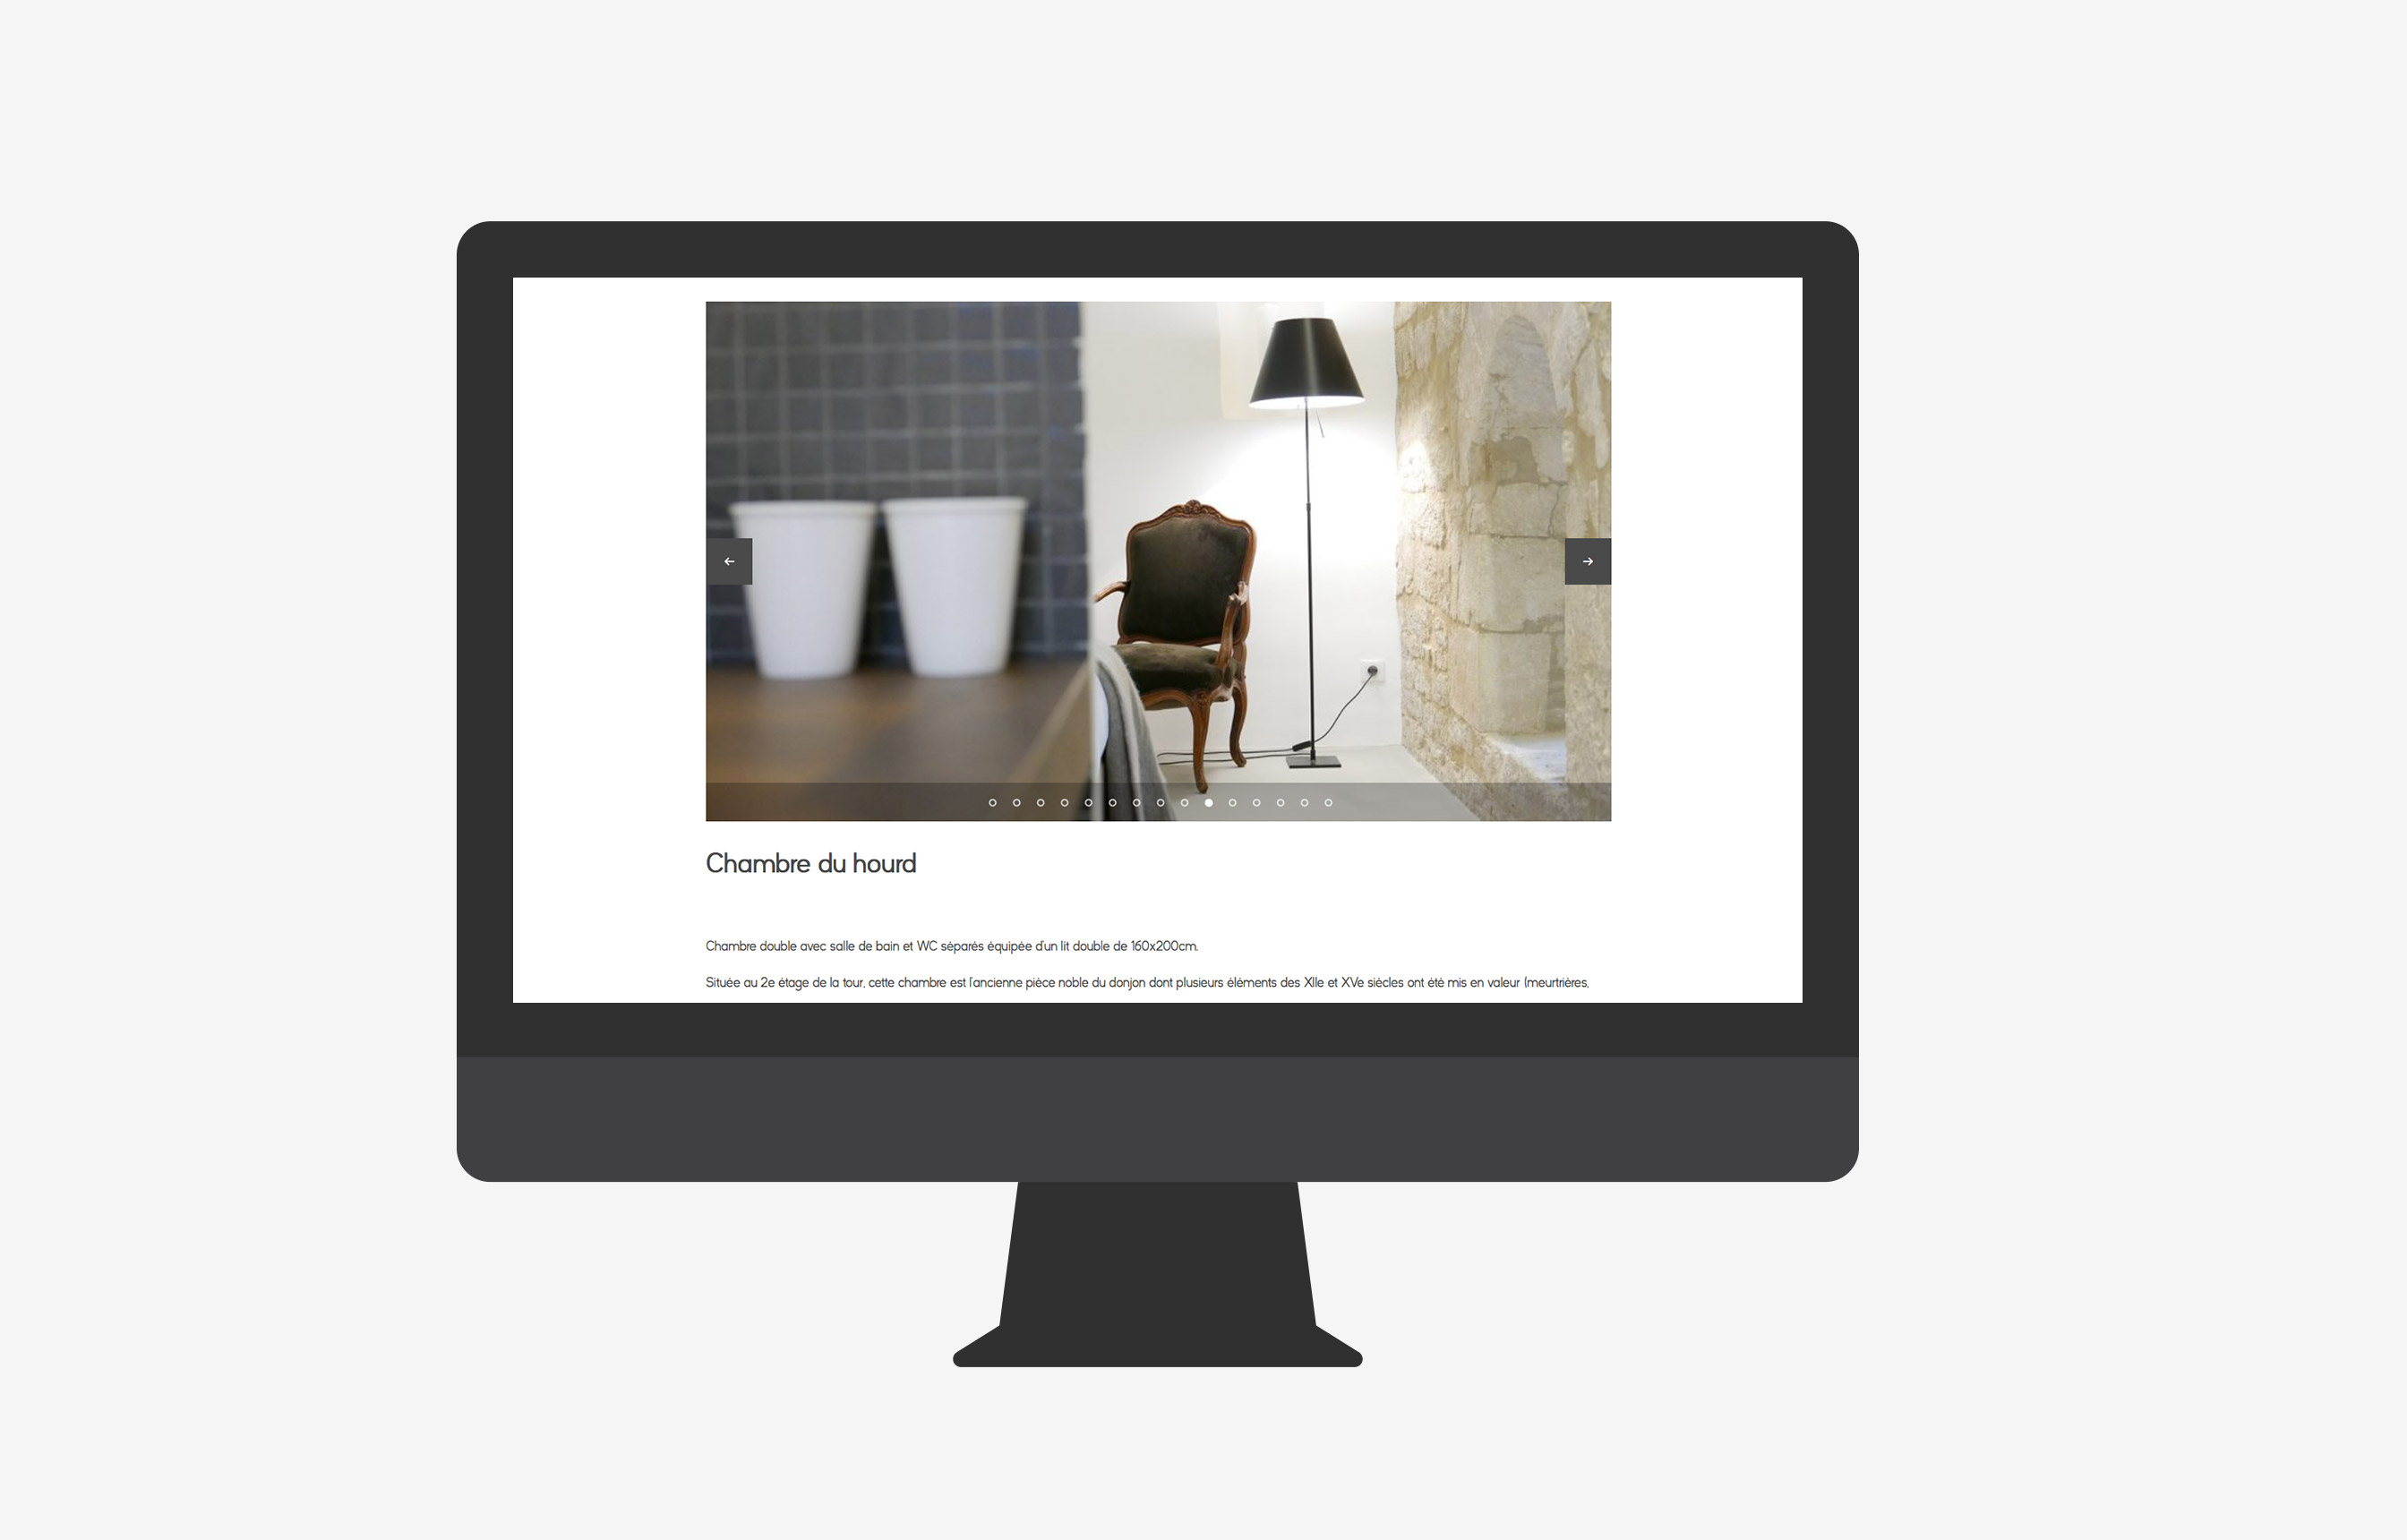 05-tour-sarrazine-pikteo-webdesign-graphic-design-freelance-paris-bruxelles-londres